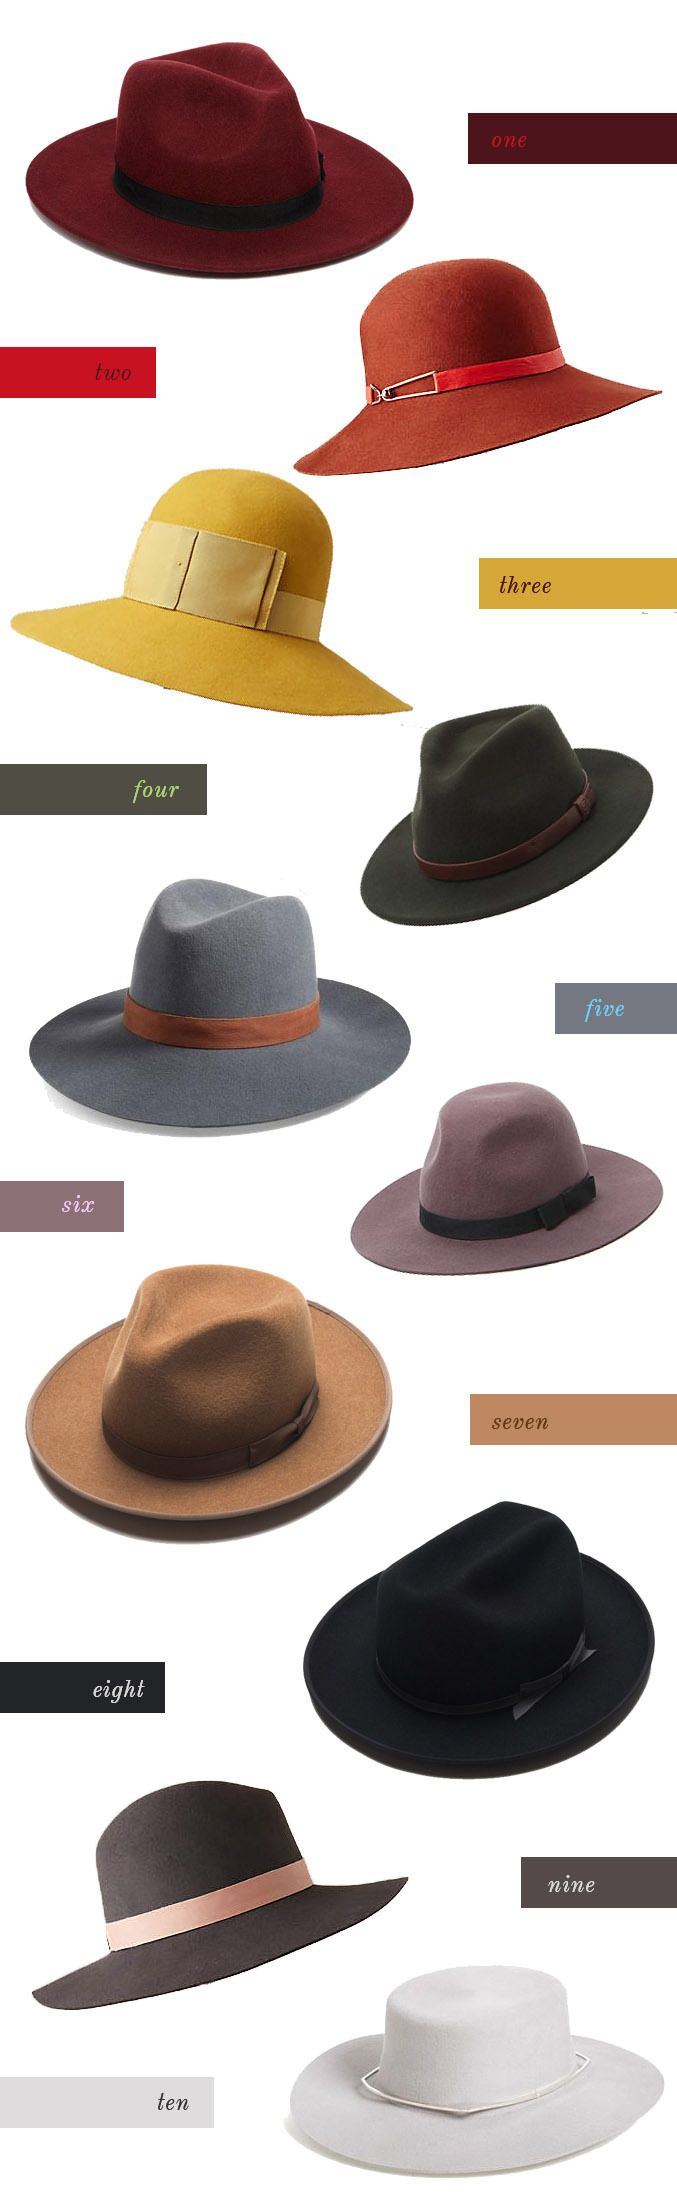 10 fall hats